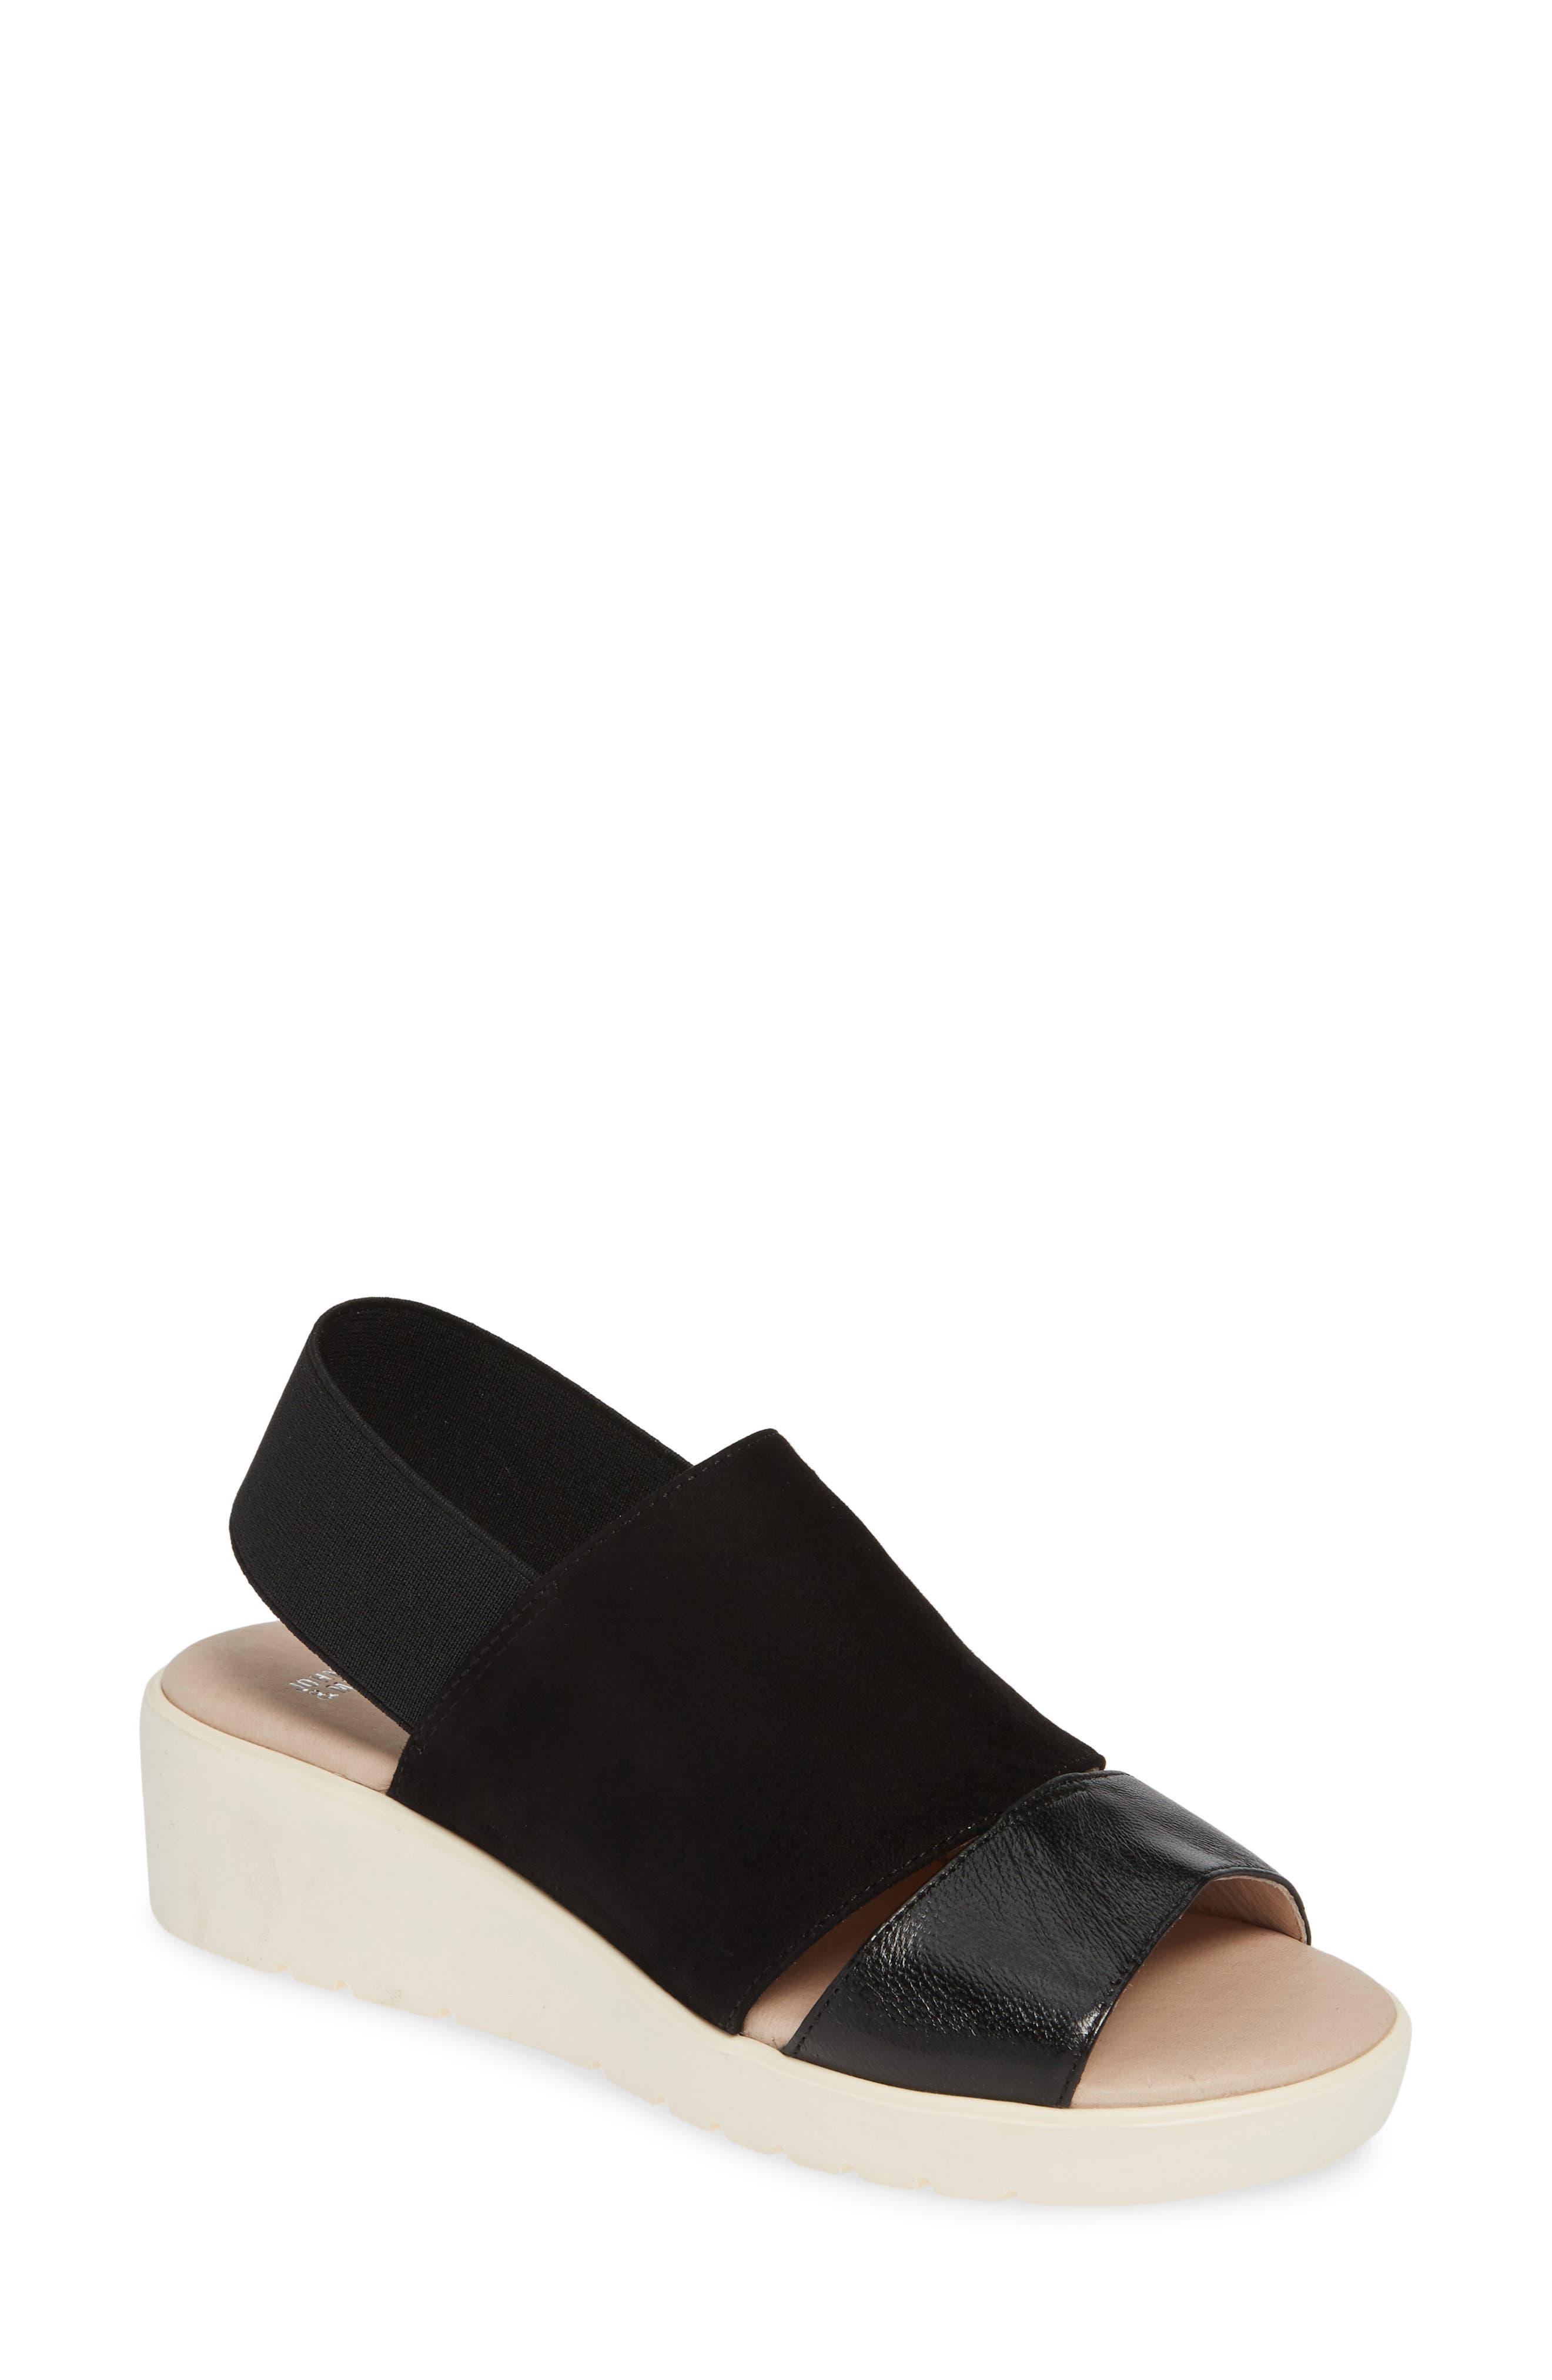 Johnston & Murphy Cassandra Slingback Platform Sandal, Black